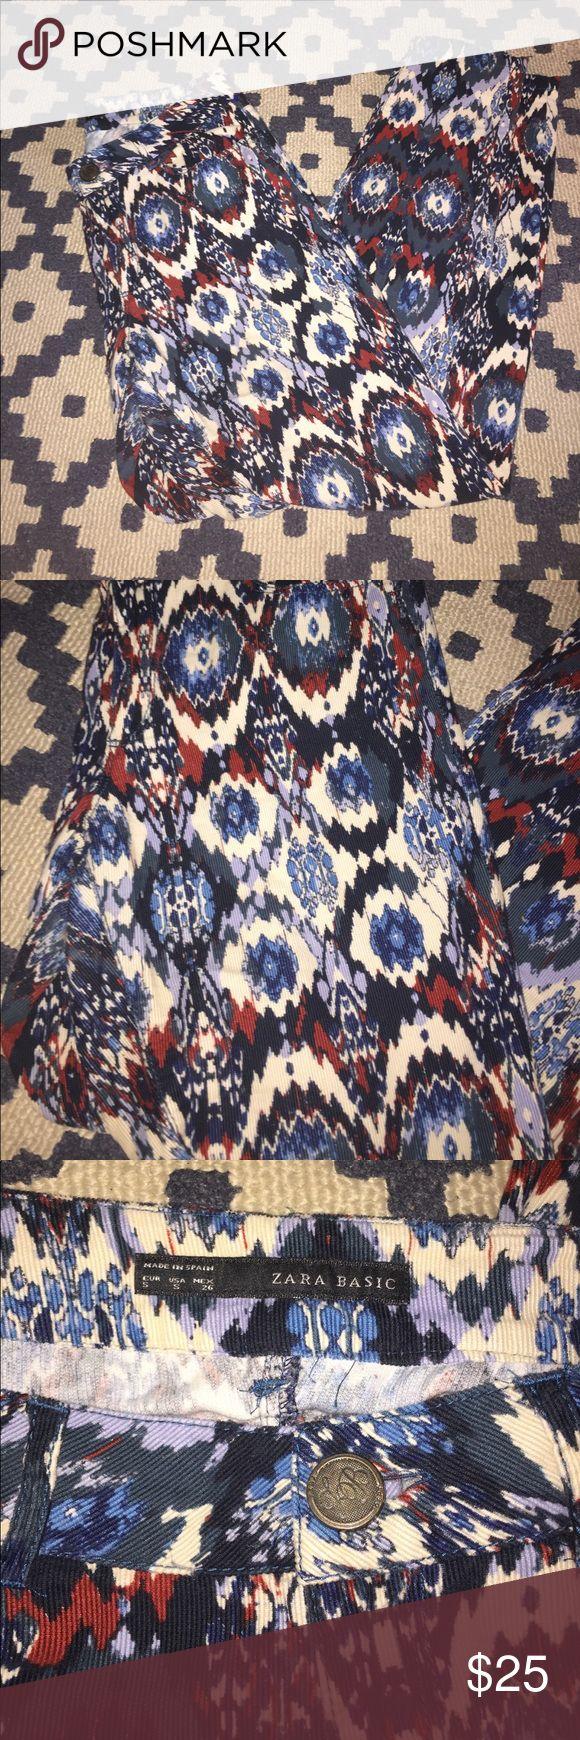 [Zara Basic] Pants Colorful Aztec pants by Zara Basic - size small. 100% cotton. Zara Pants Skinny